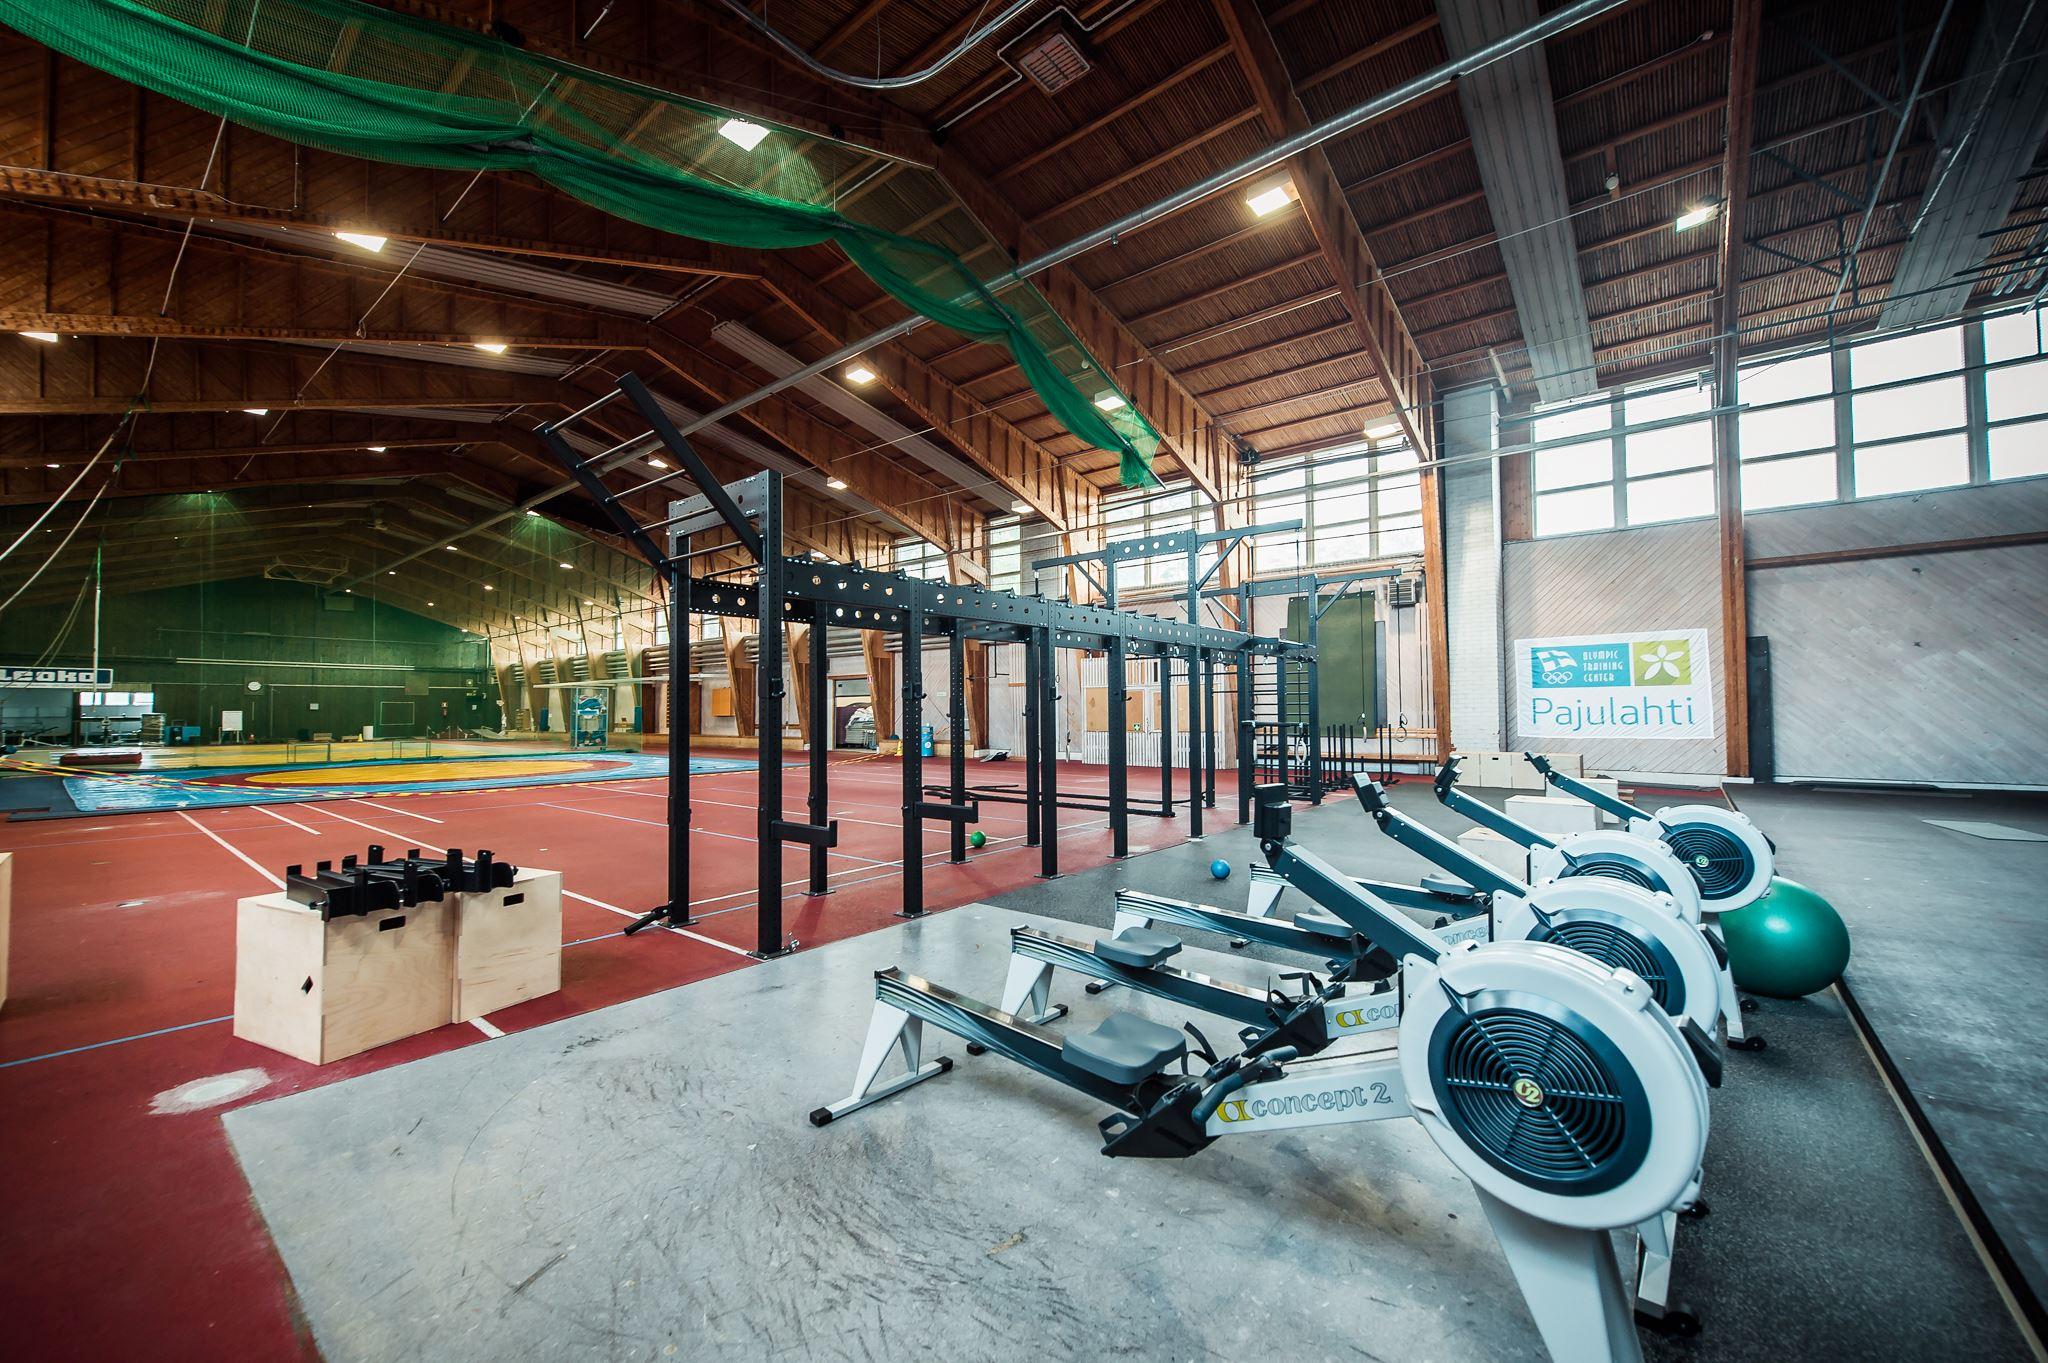 Cross training -viikonloppu Liikuntakeskus Pajulahdessa 15.-17.2.2019